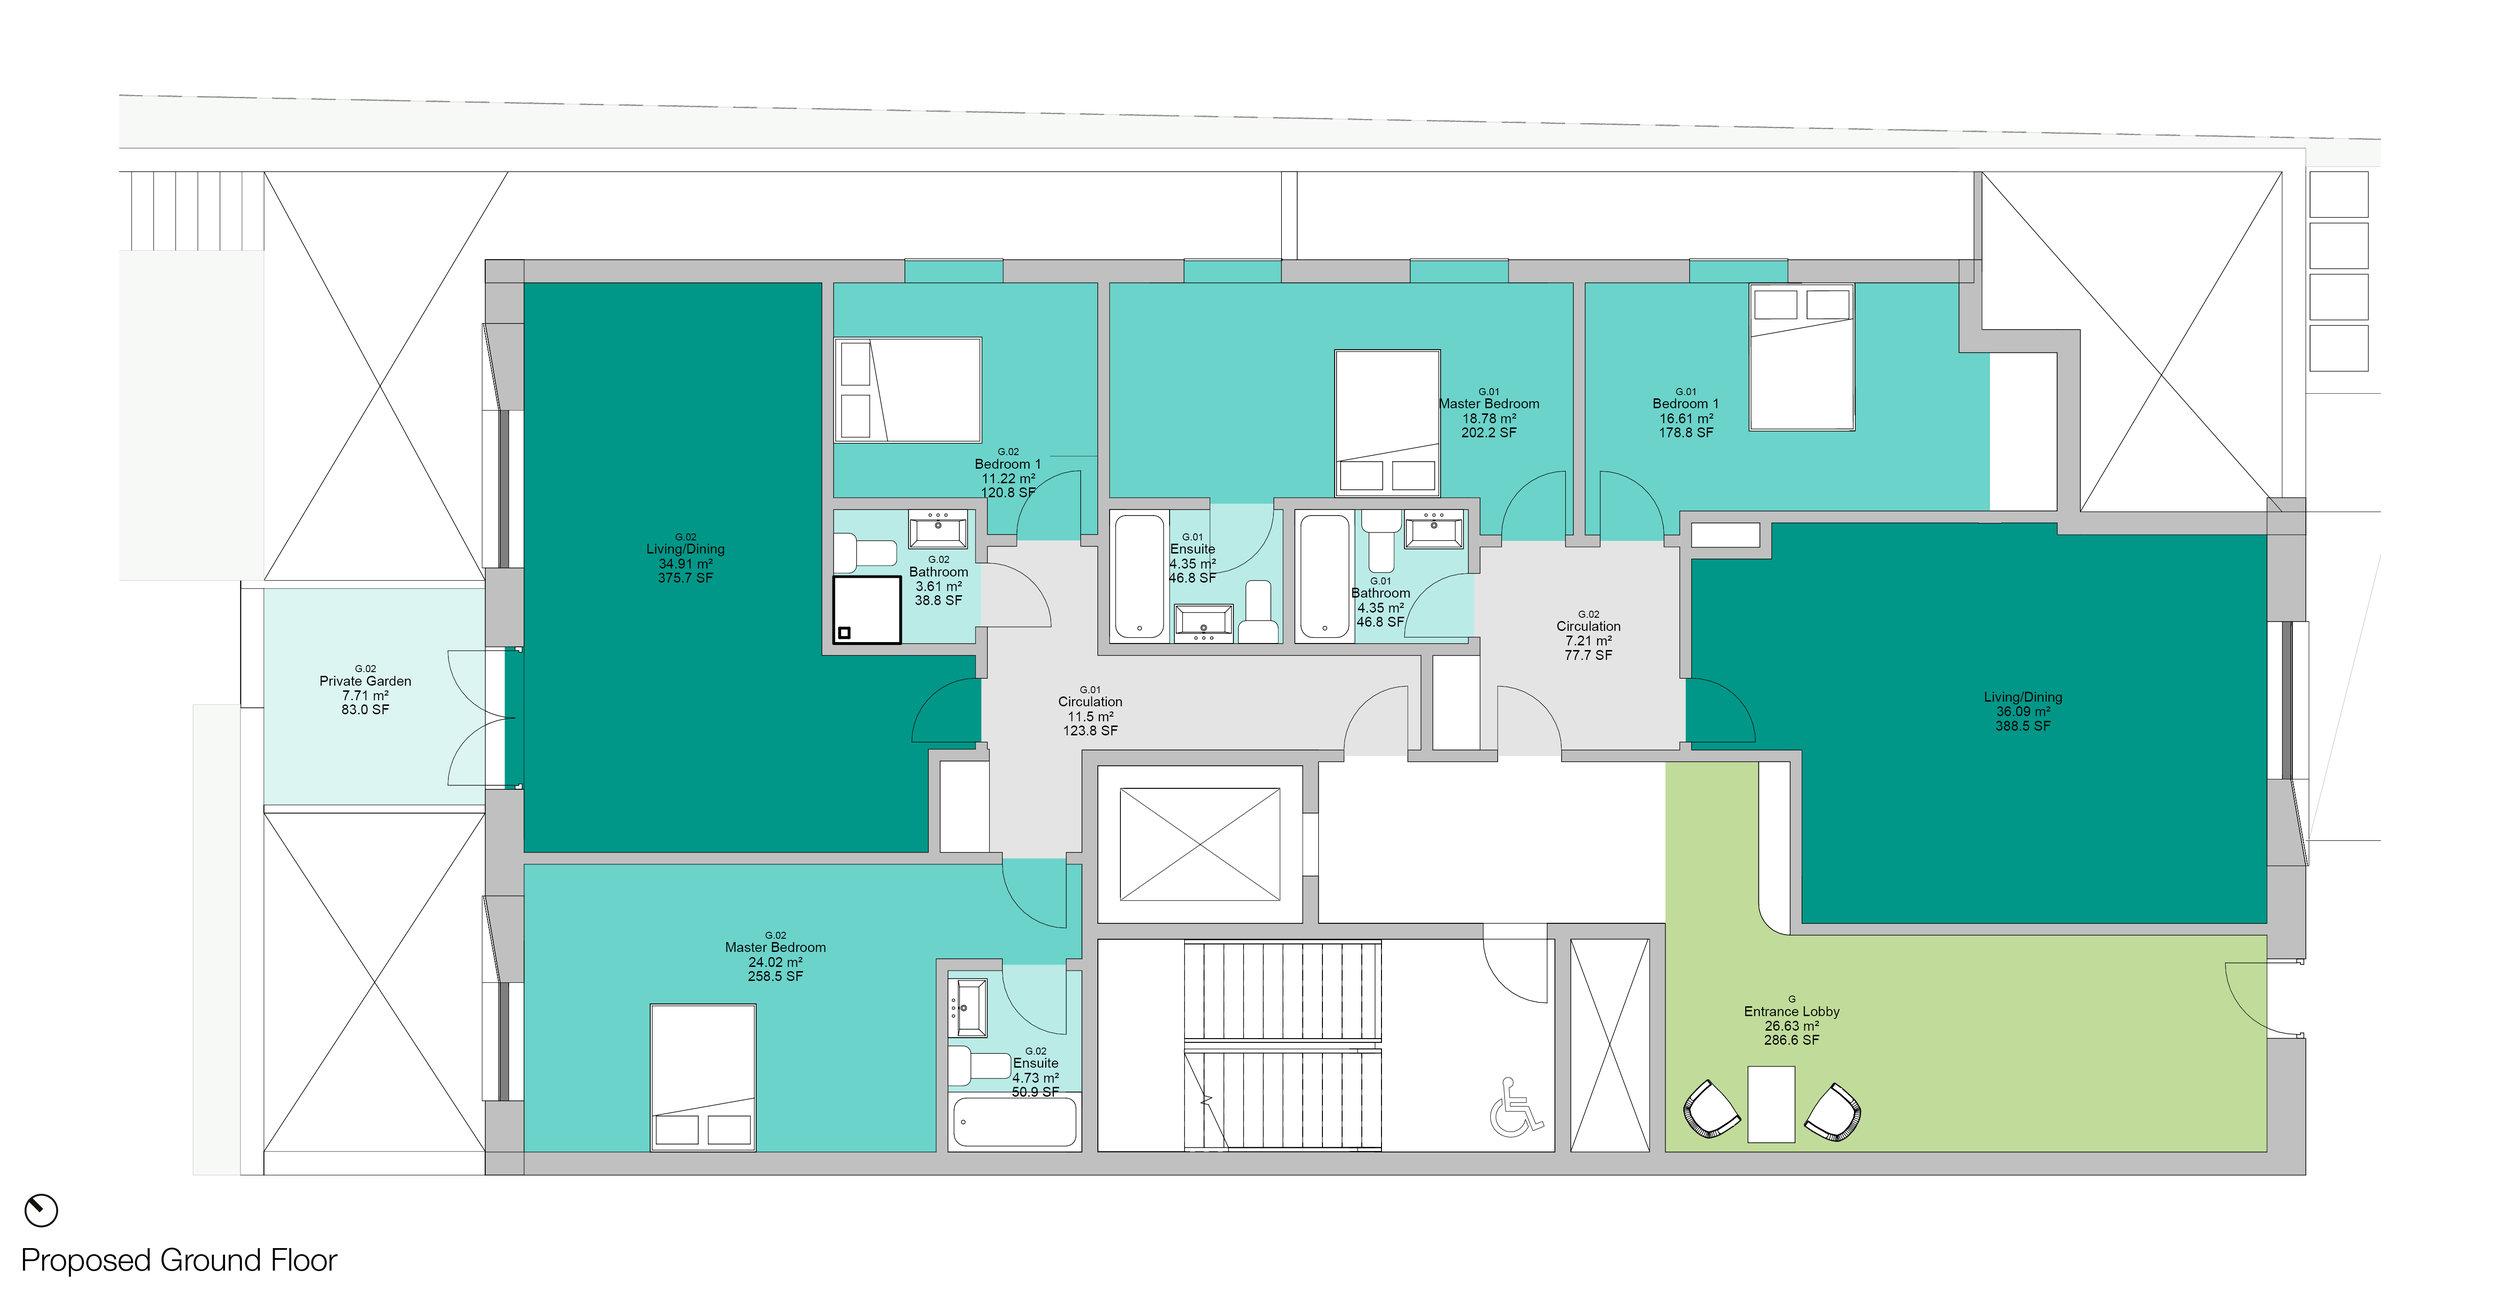 © Copyright Studio DS 2018 - the Multi Home Smart Home Ground Floor Plan